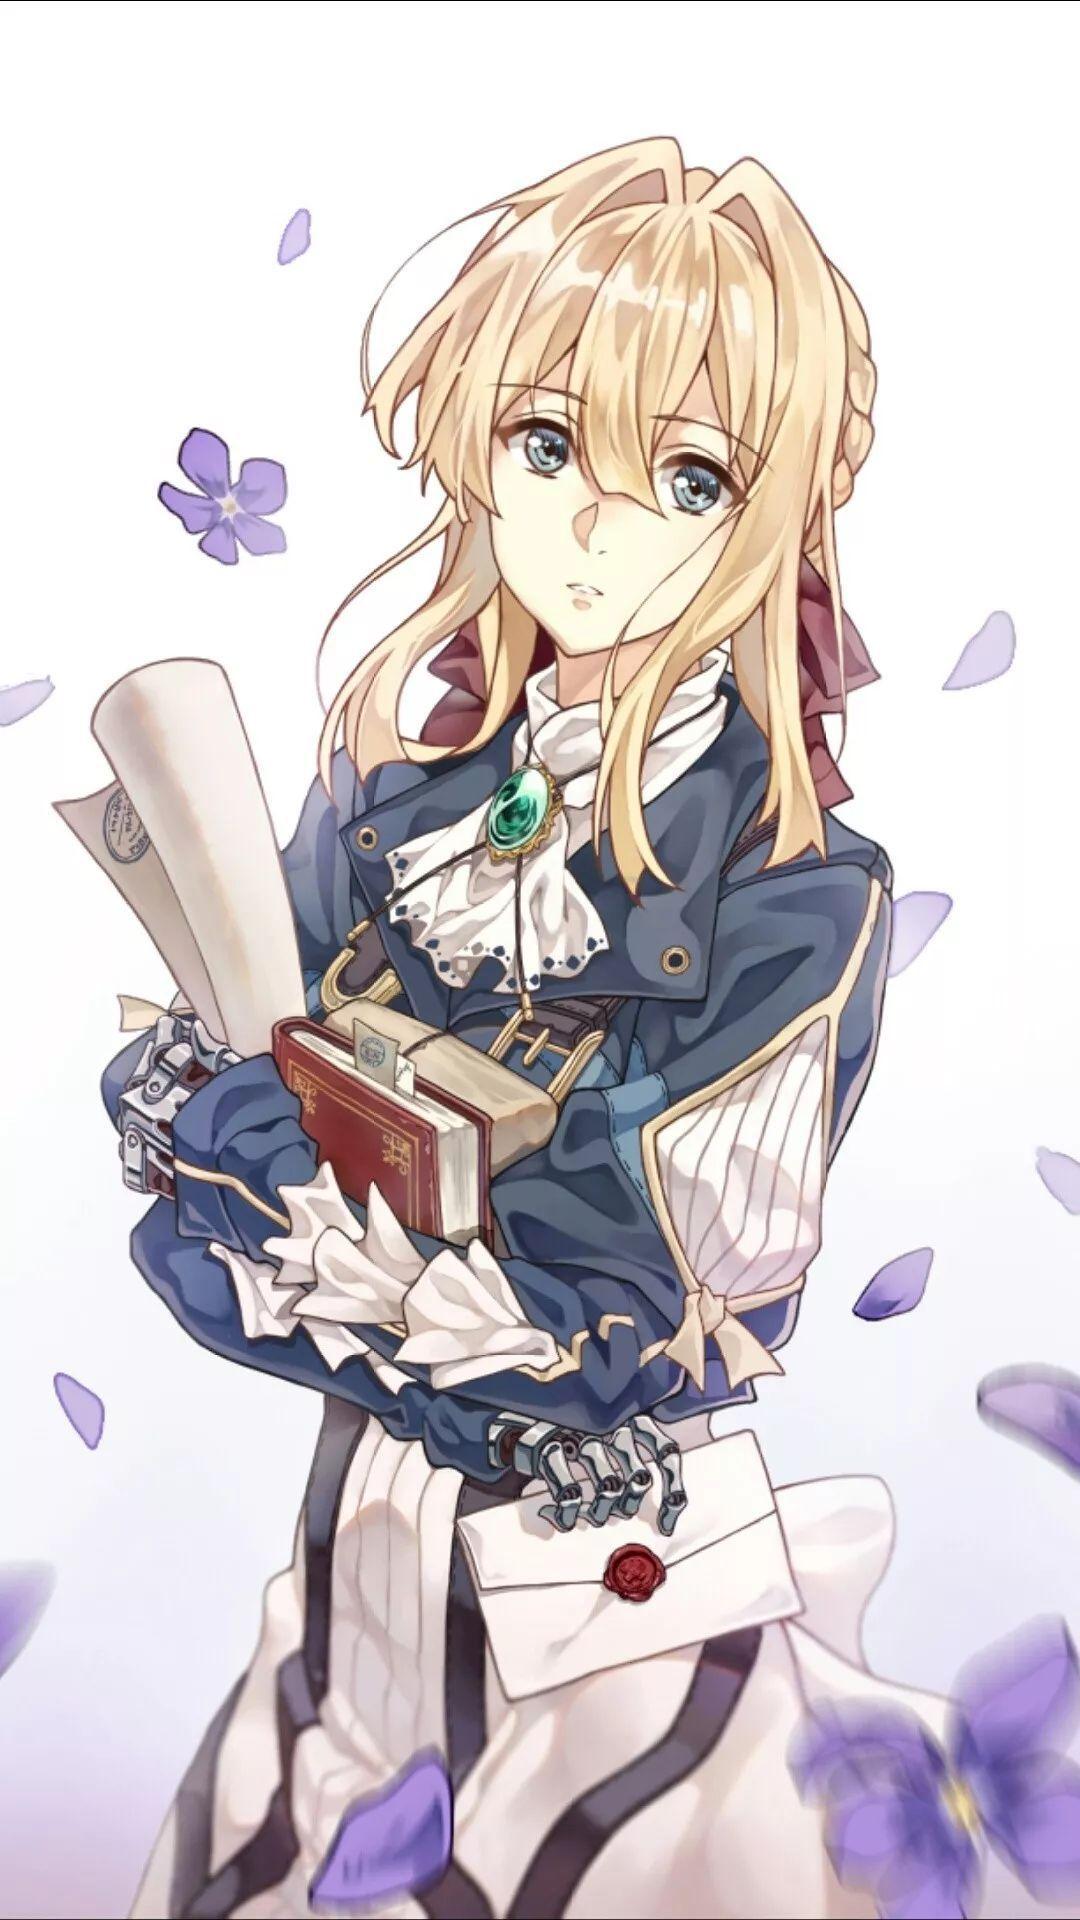 Anime Art Violet Ervergarden Violet Evergarden Violet Evergarden Anime Violet Evergreen Anime